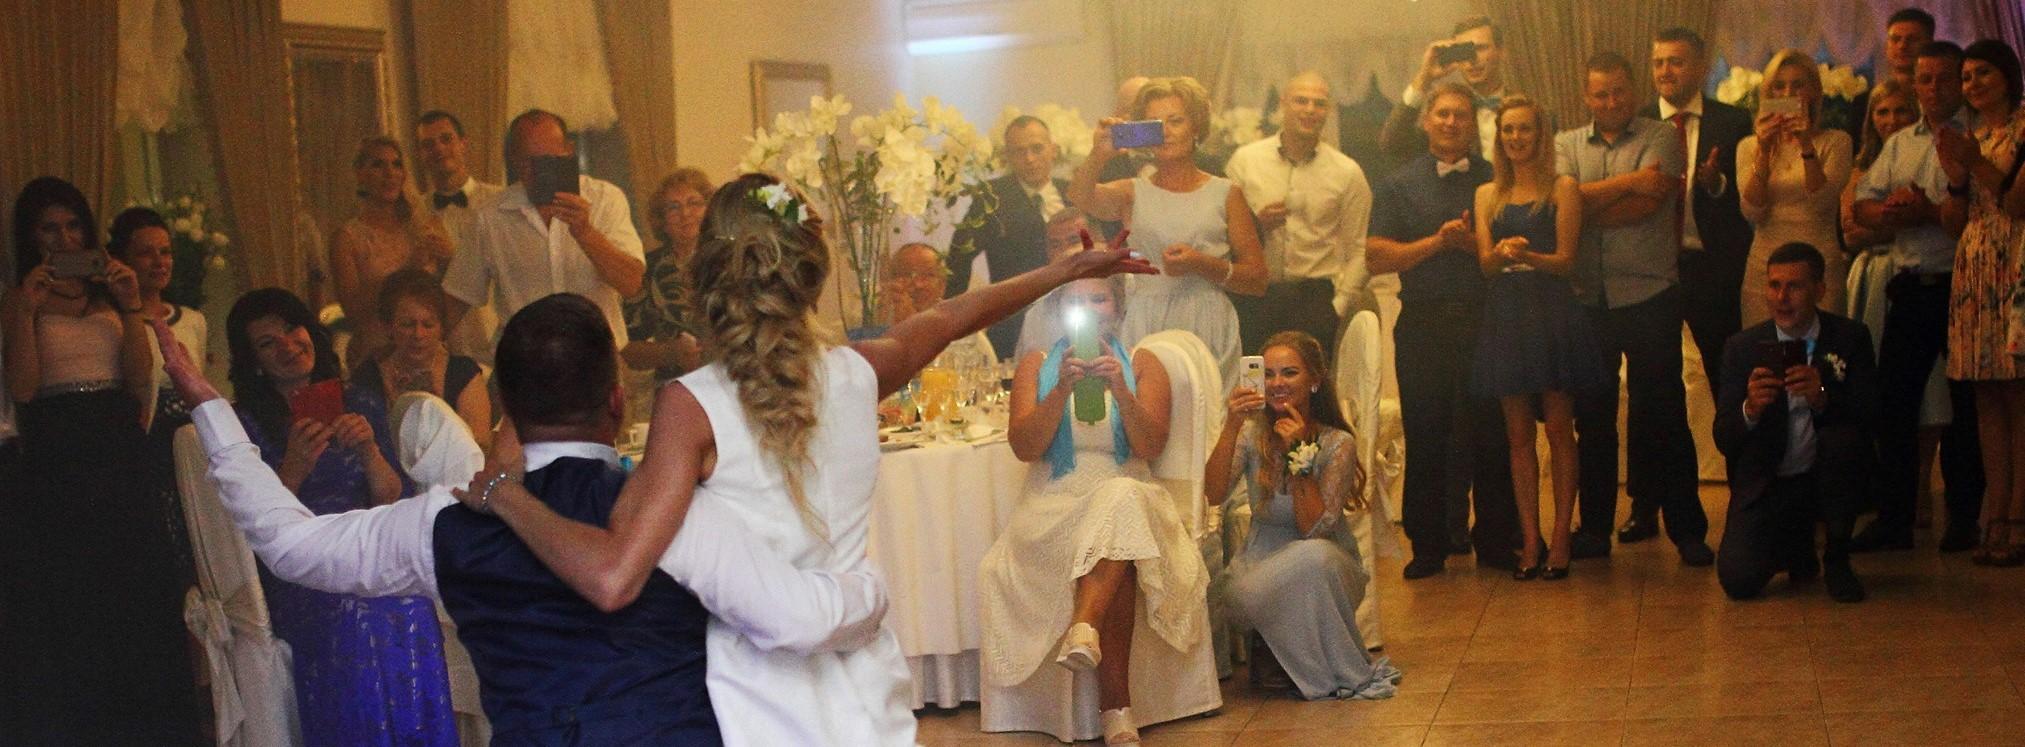 Vestuvinis sokis kaune